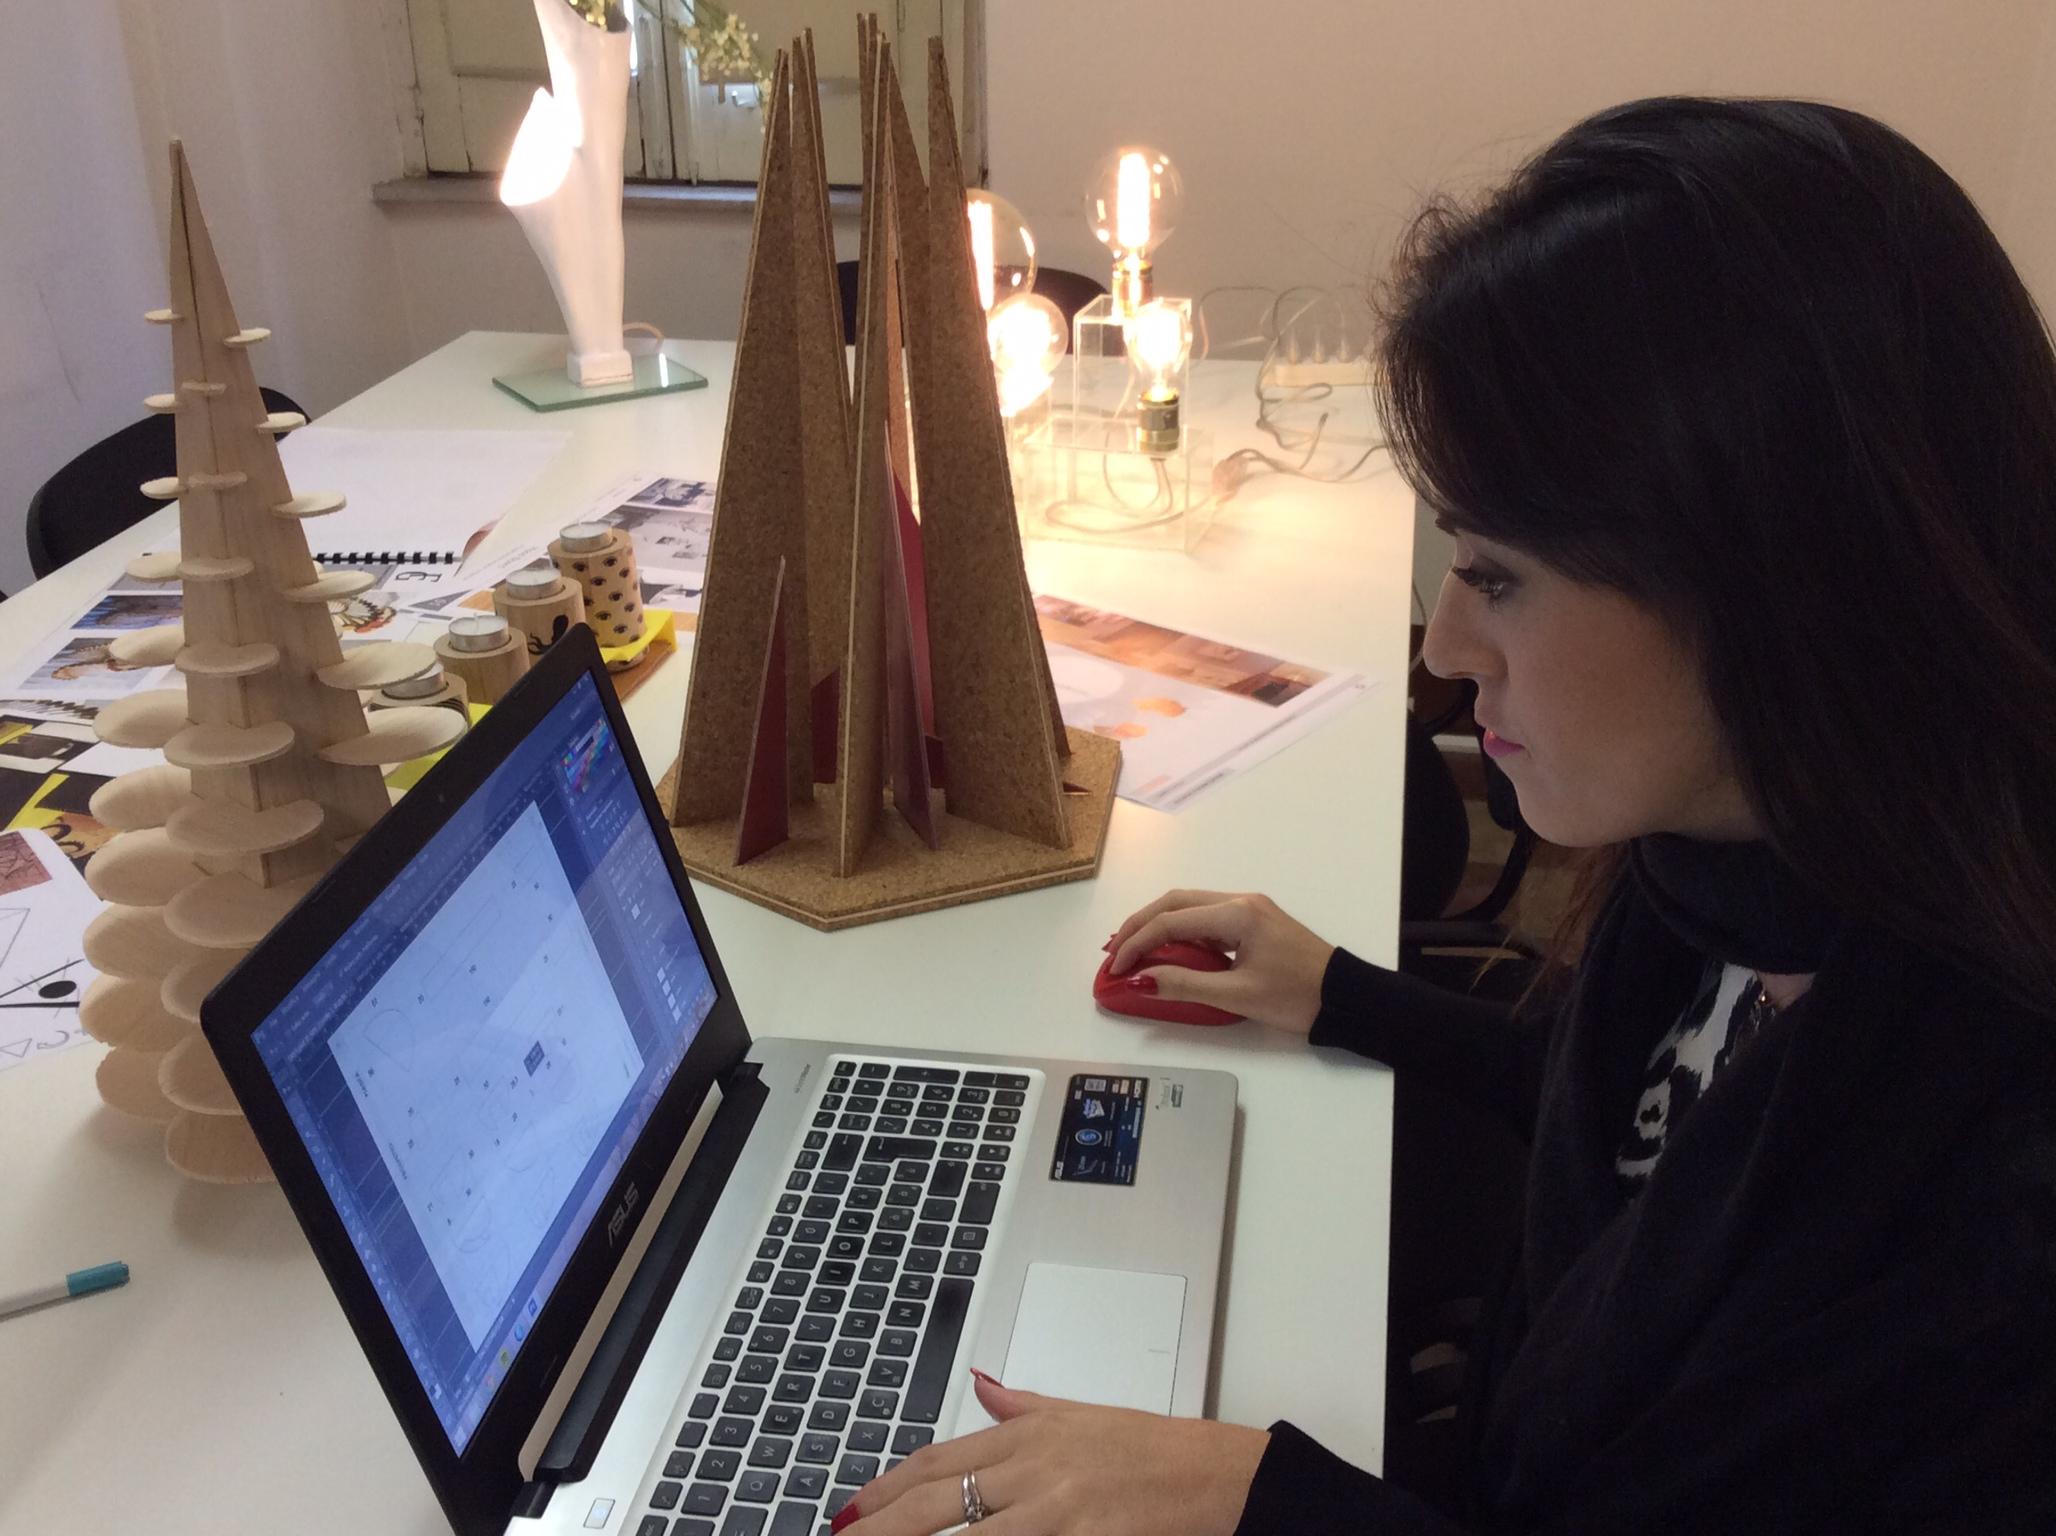 Flavia dal brasile a catania per studiare design liveunict - Studiare interior design ...